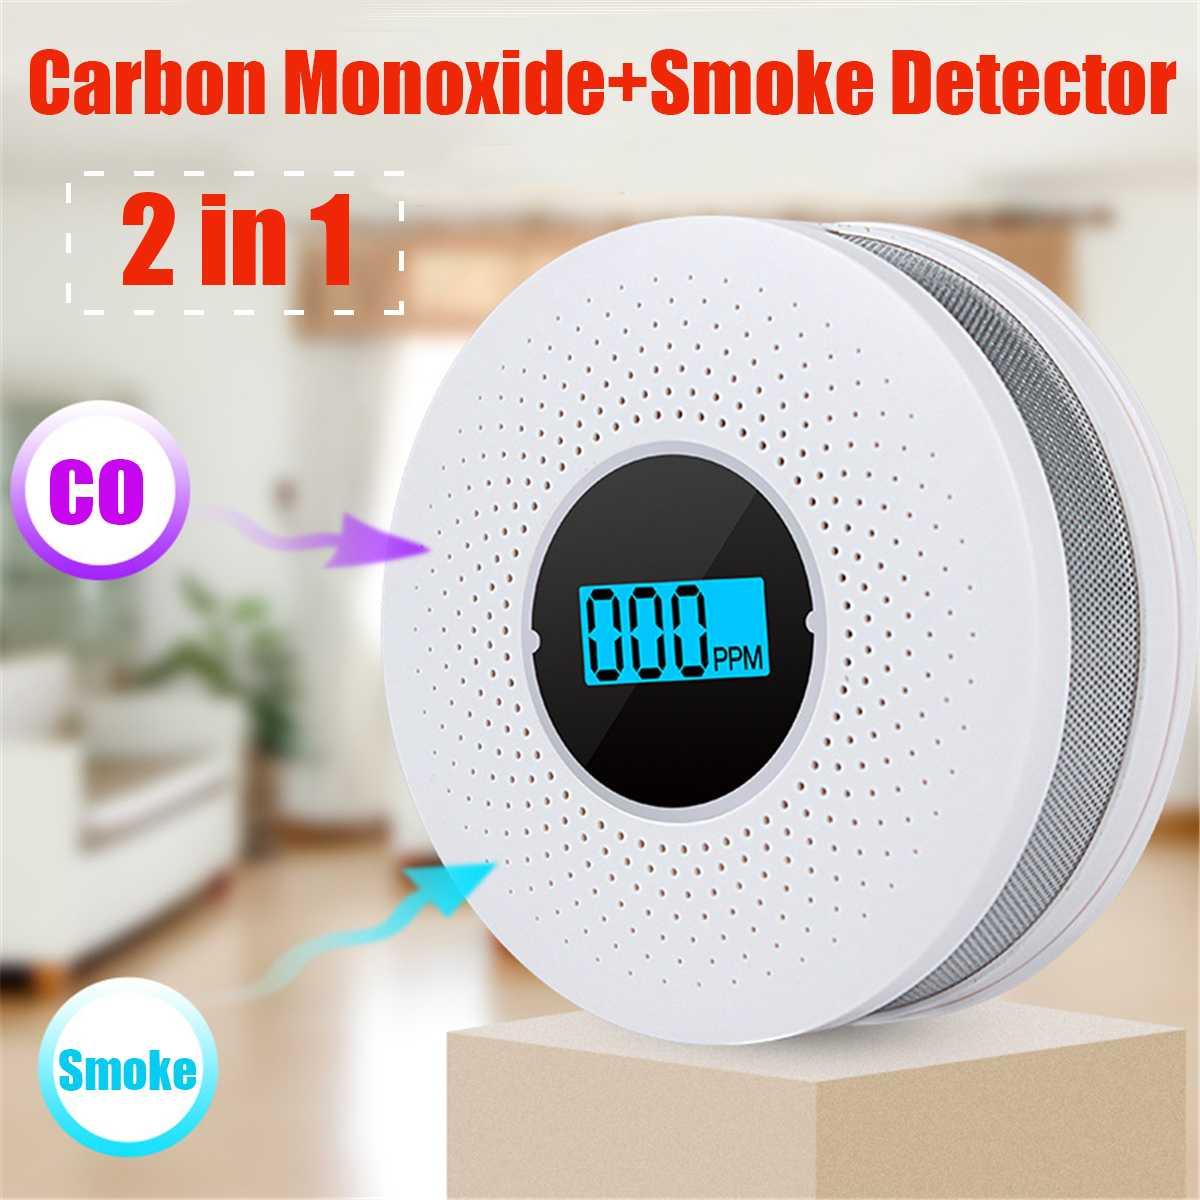 2 in 1 LED Digital Gas Smoke Alarm Co Carbon Monoxide Detector Voice Warn Sensor Home Security Protection High Sensitive